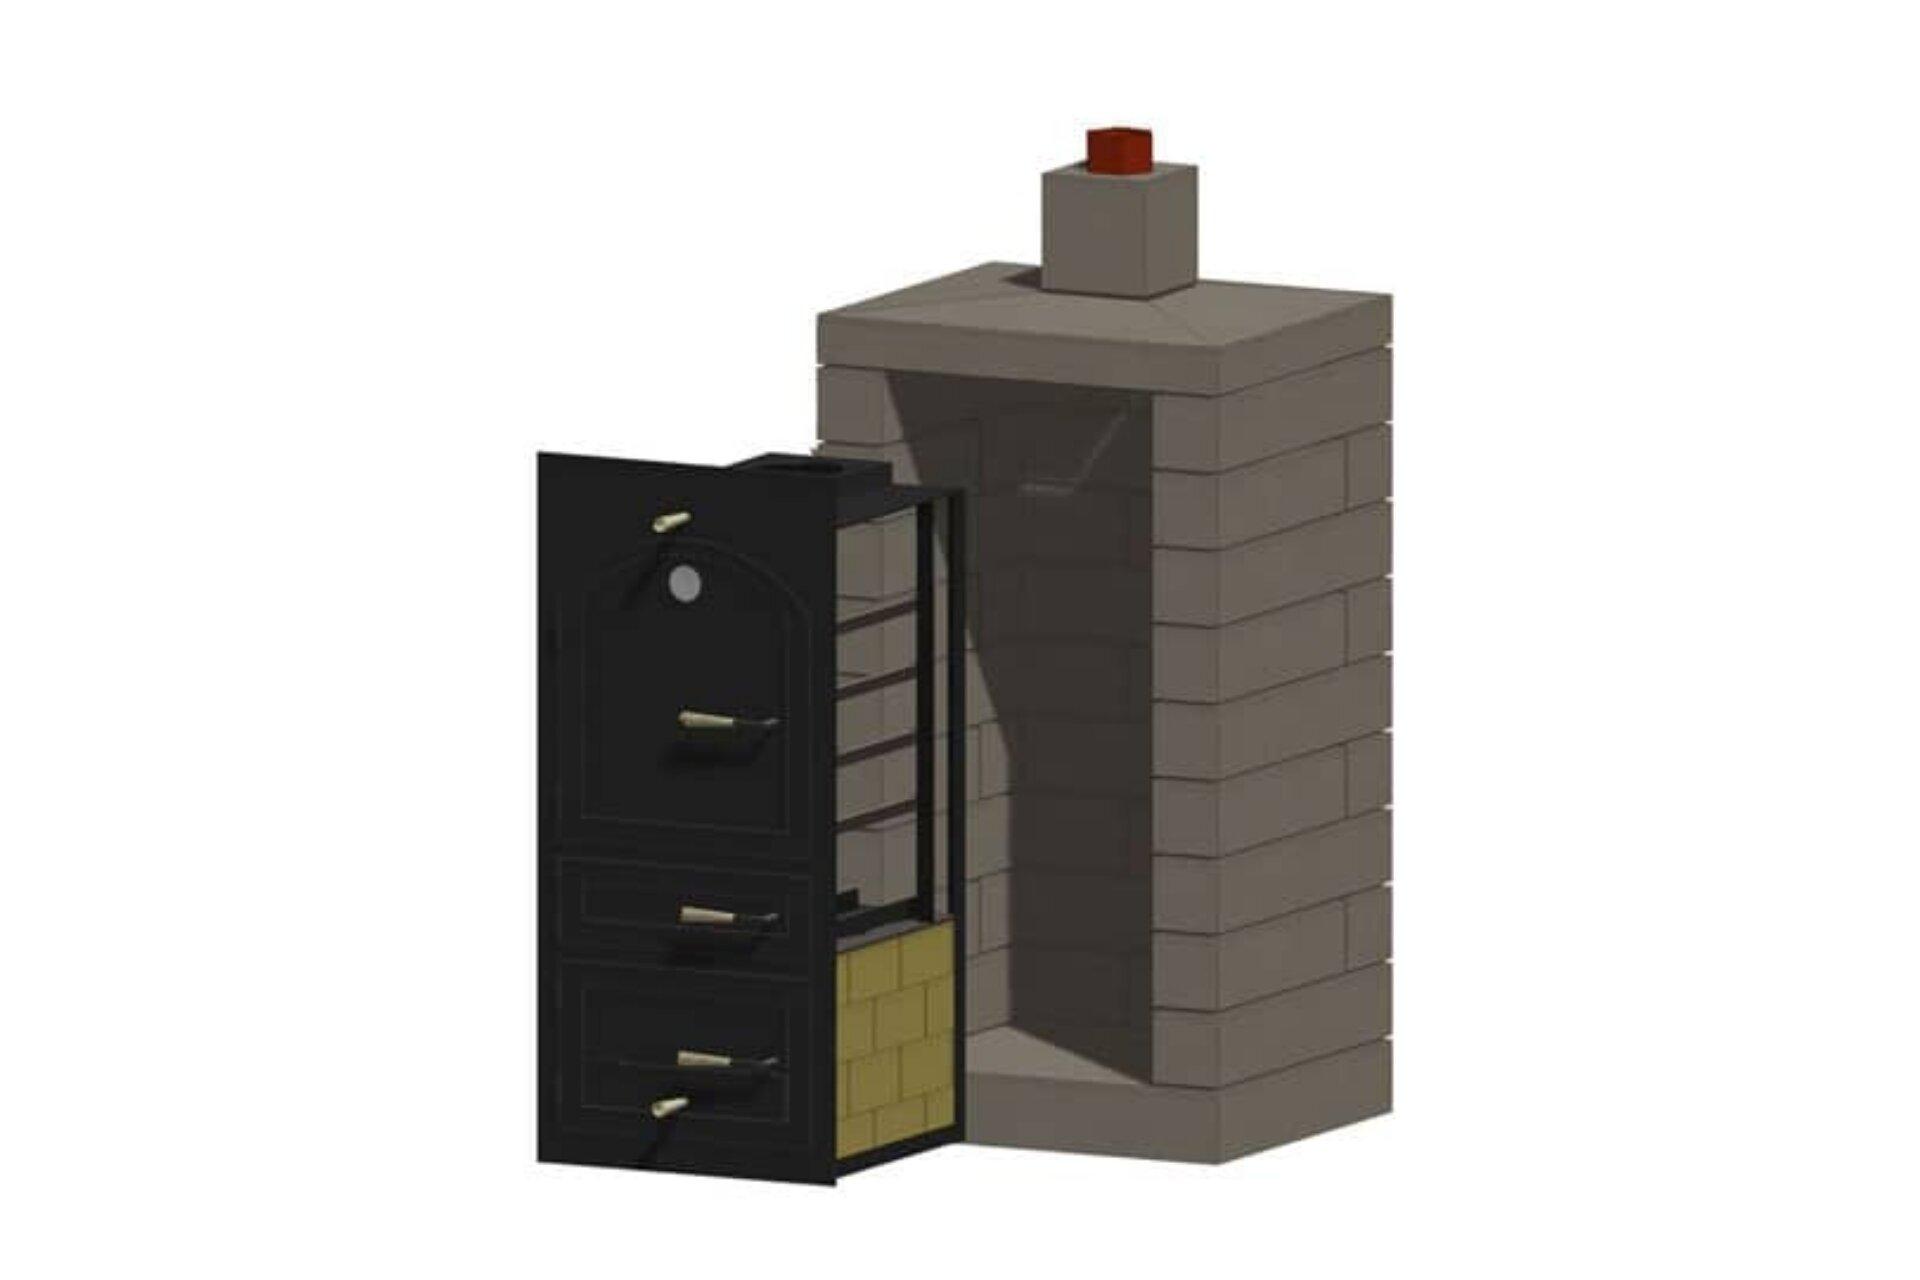 Little Pig Smoker Masonry Enclosure Kit